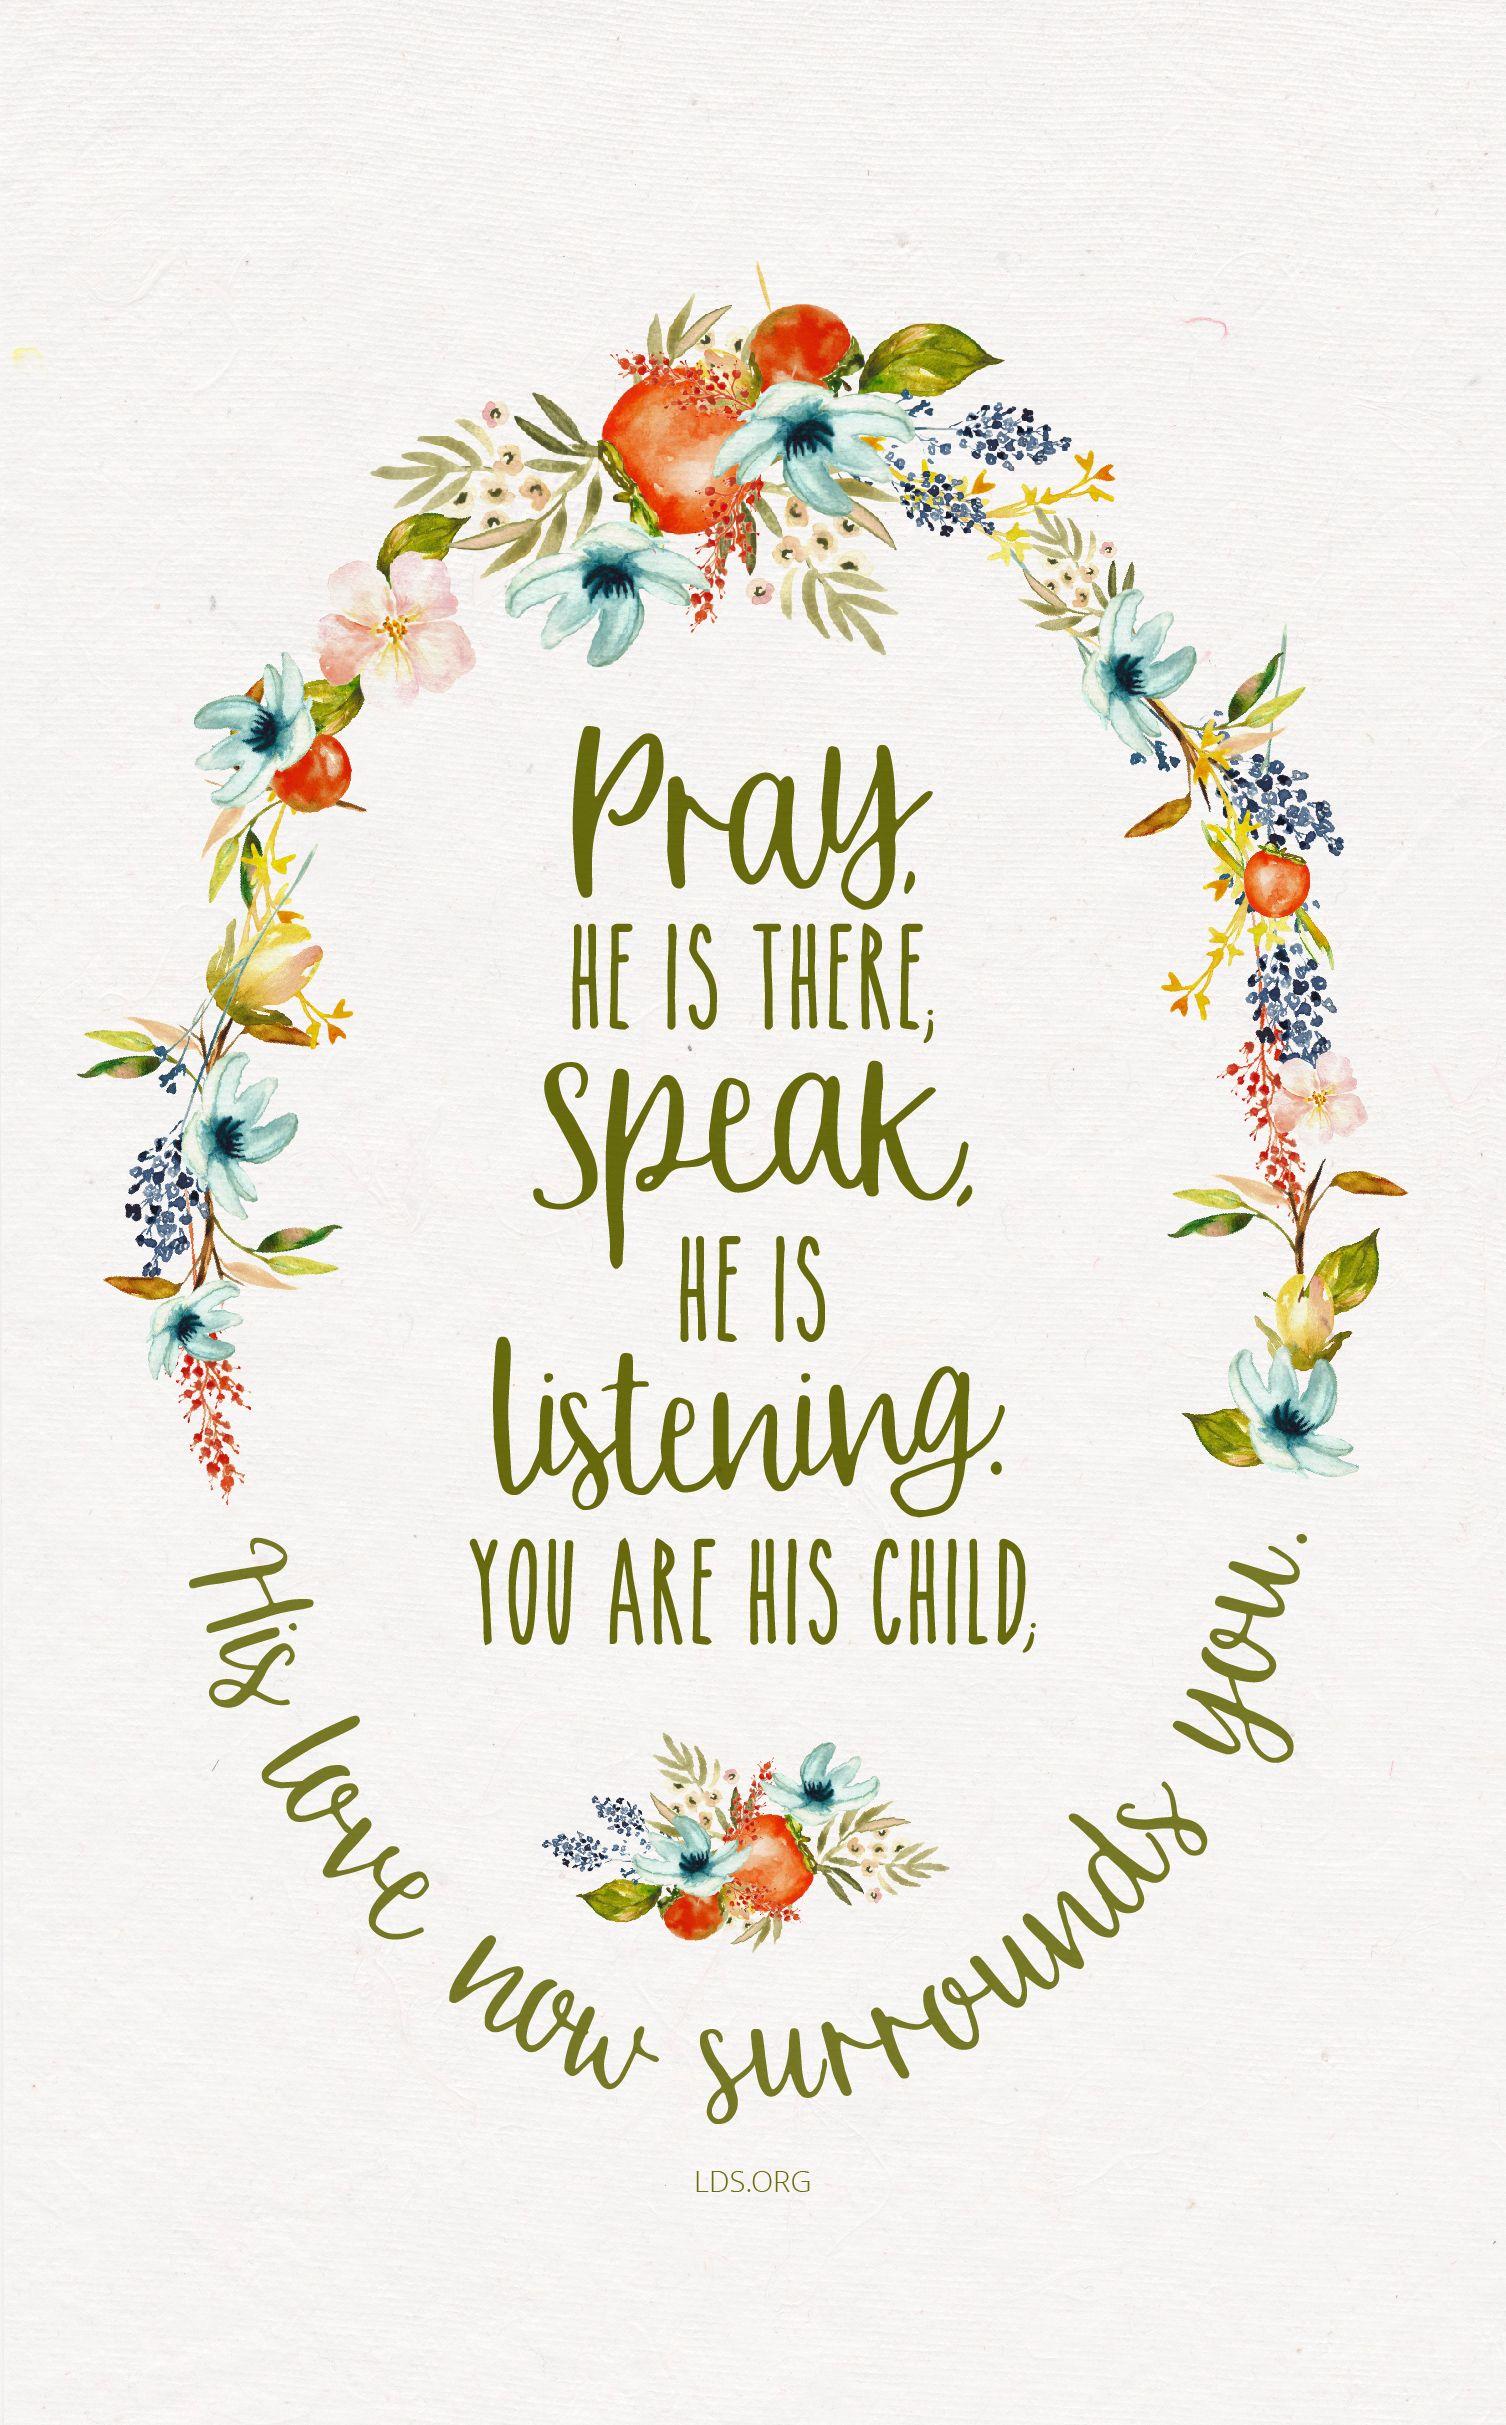 A Childs Prayer Lds For The Spirit Prayers Lds Quotes Lds